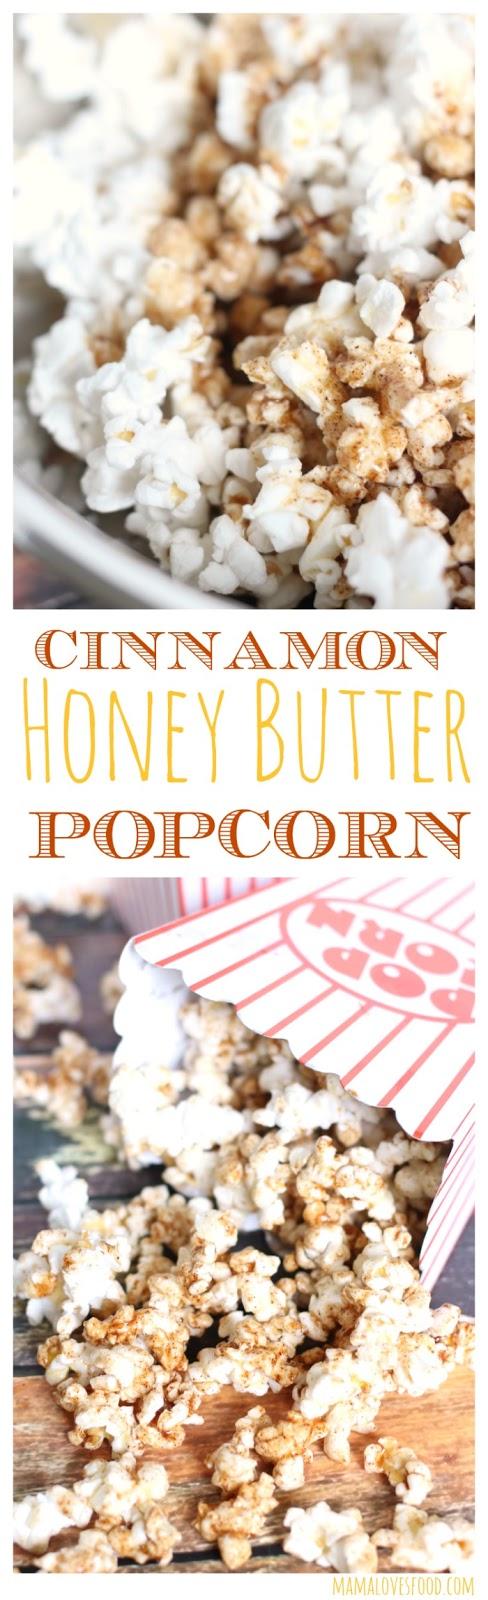 Cinnamon Honey Butter Popcorn Recipe - perfect family movie night treat :-D #haveajollytime #ad